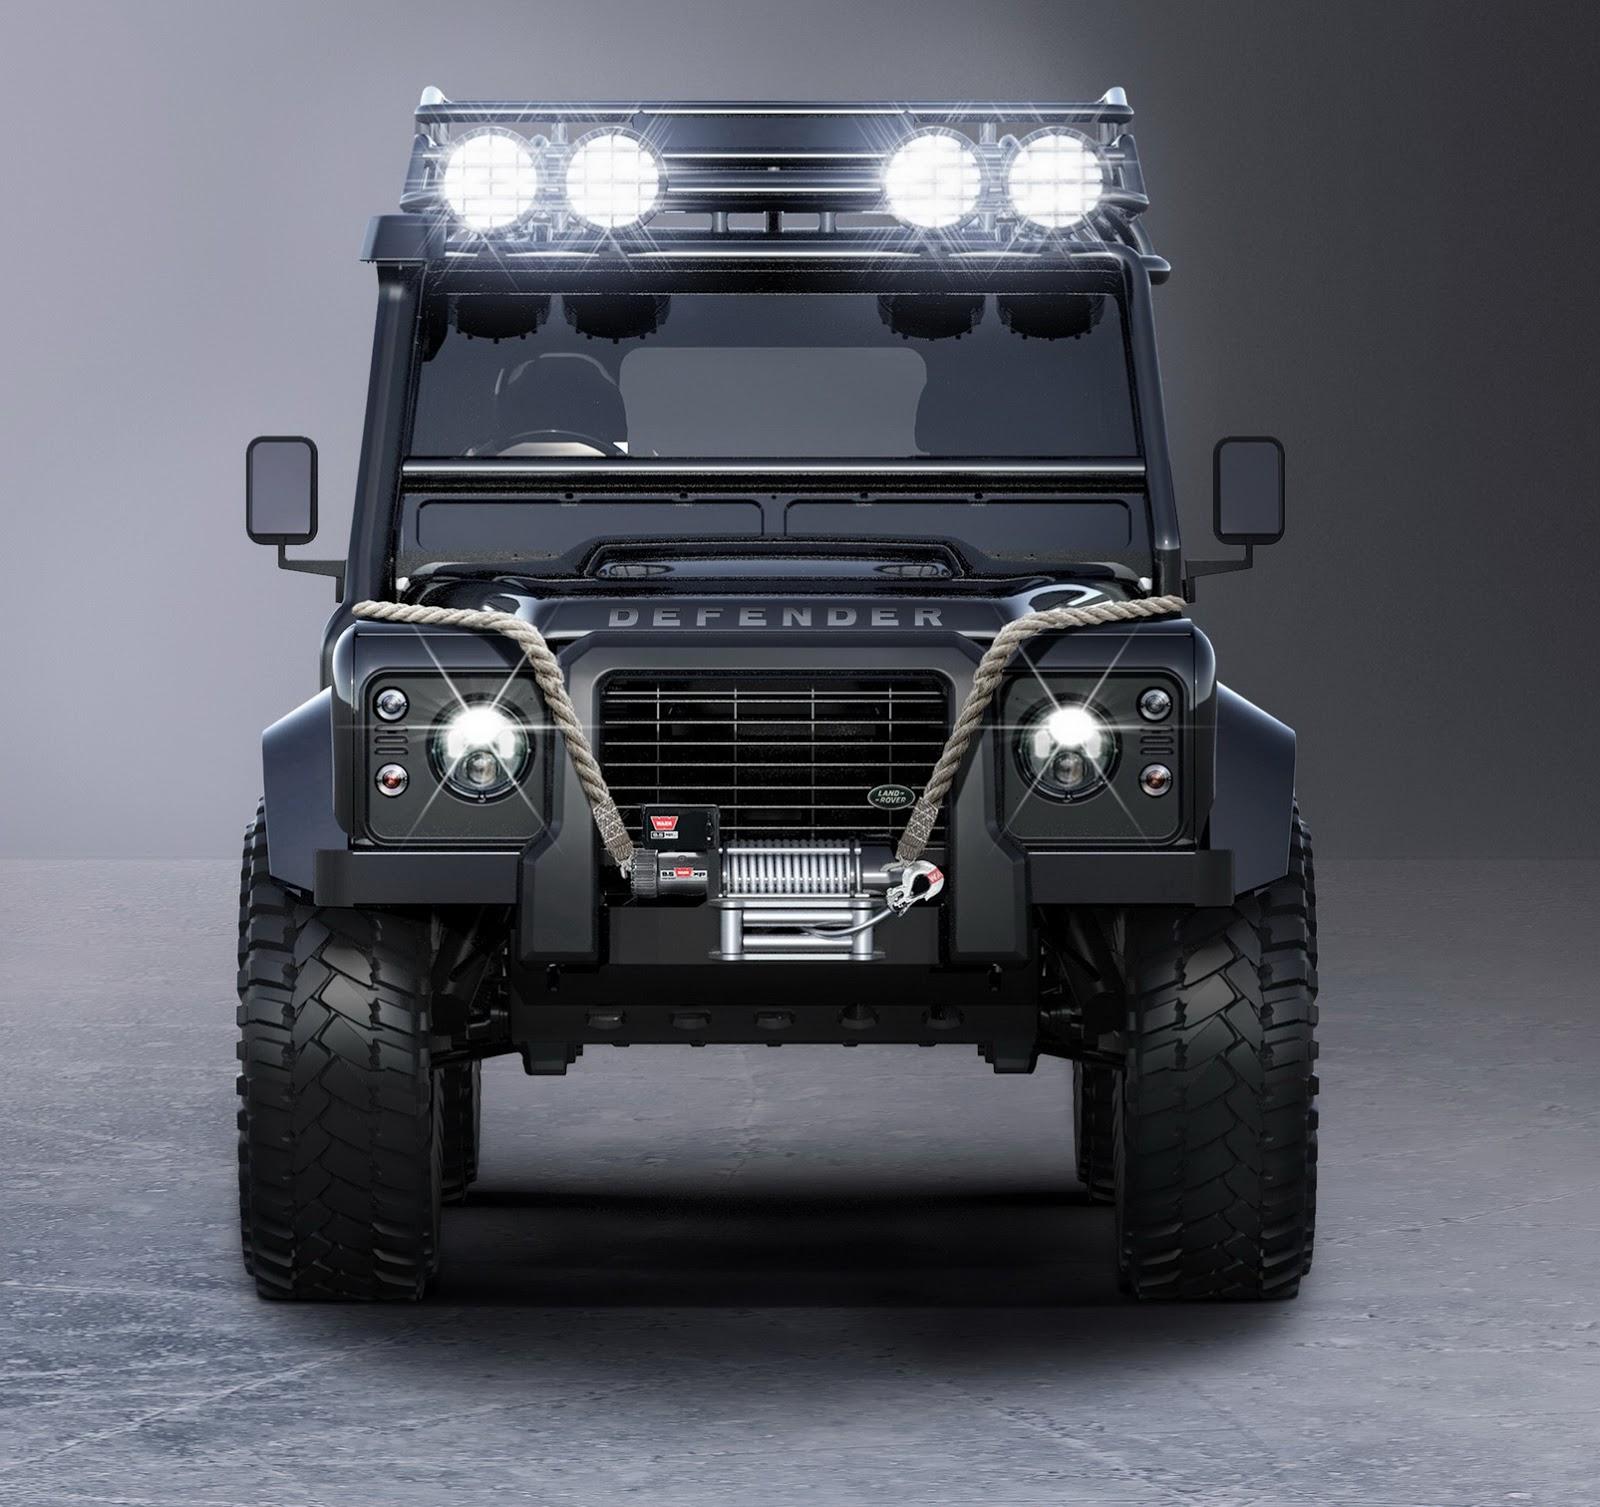 Meet Bond's Modded Land Rover Defender From 'Spectre